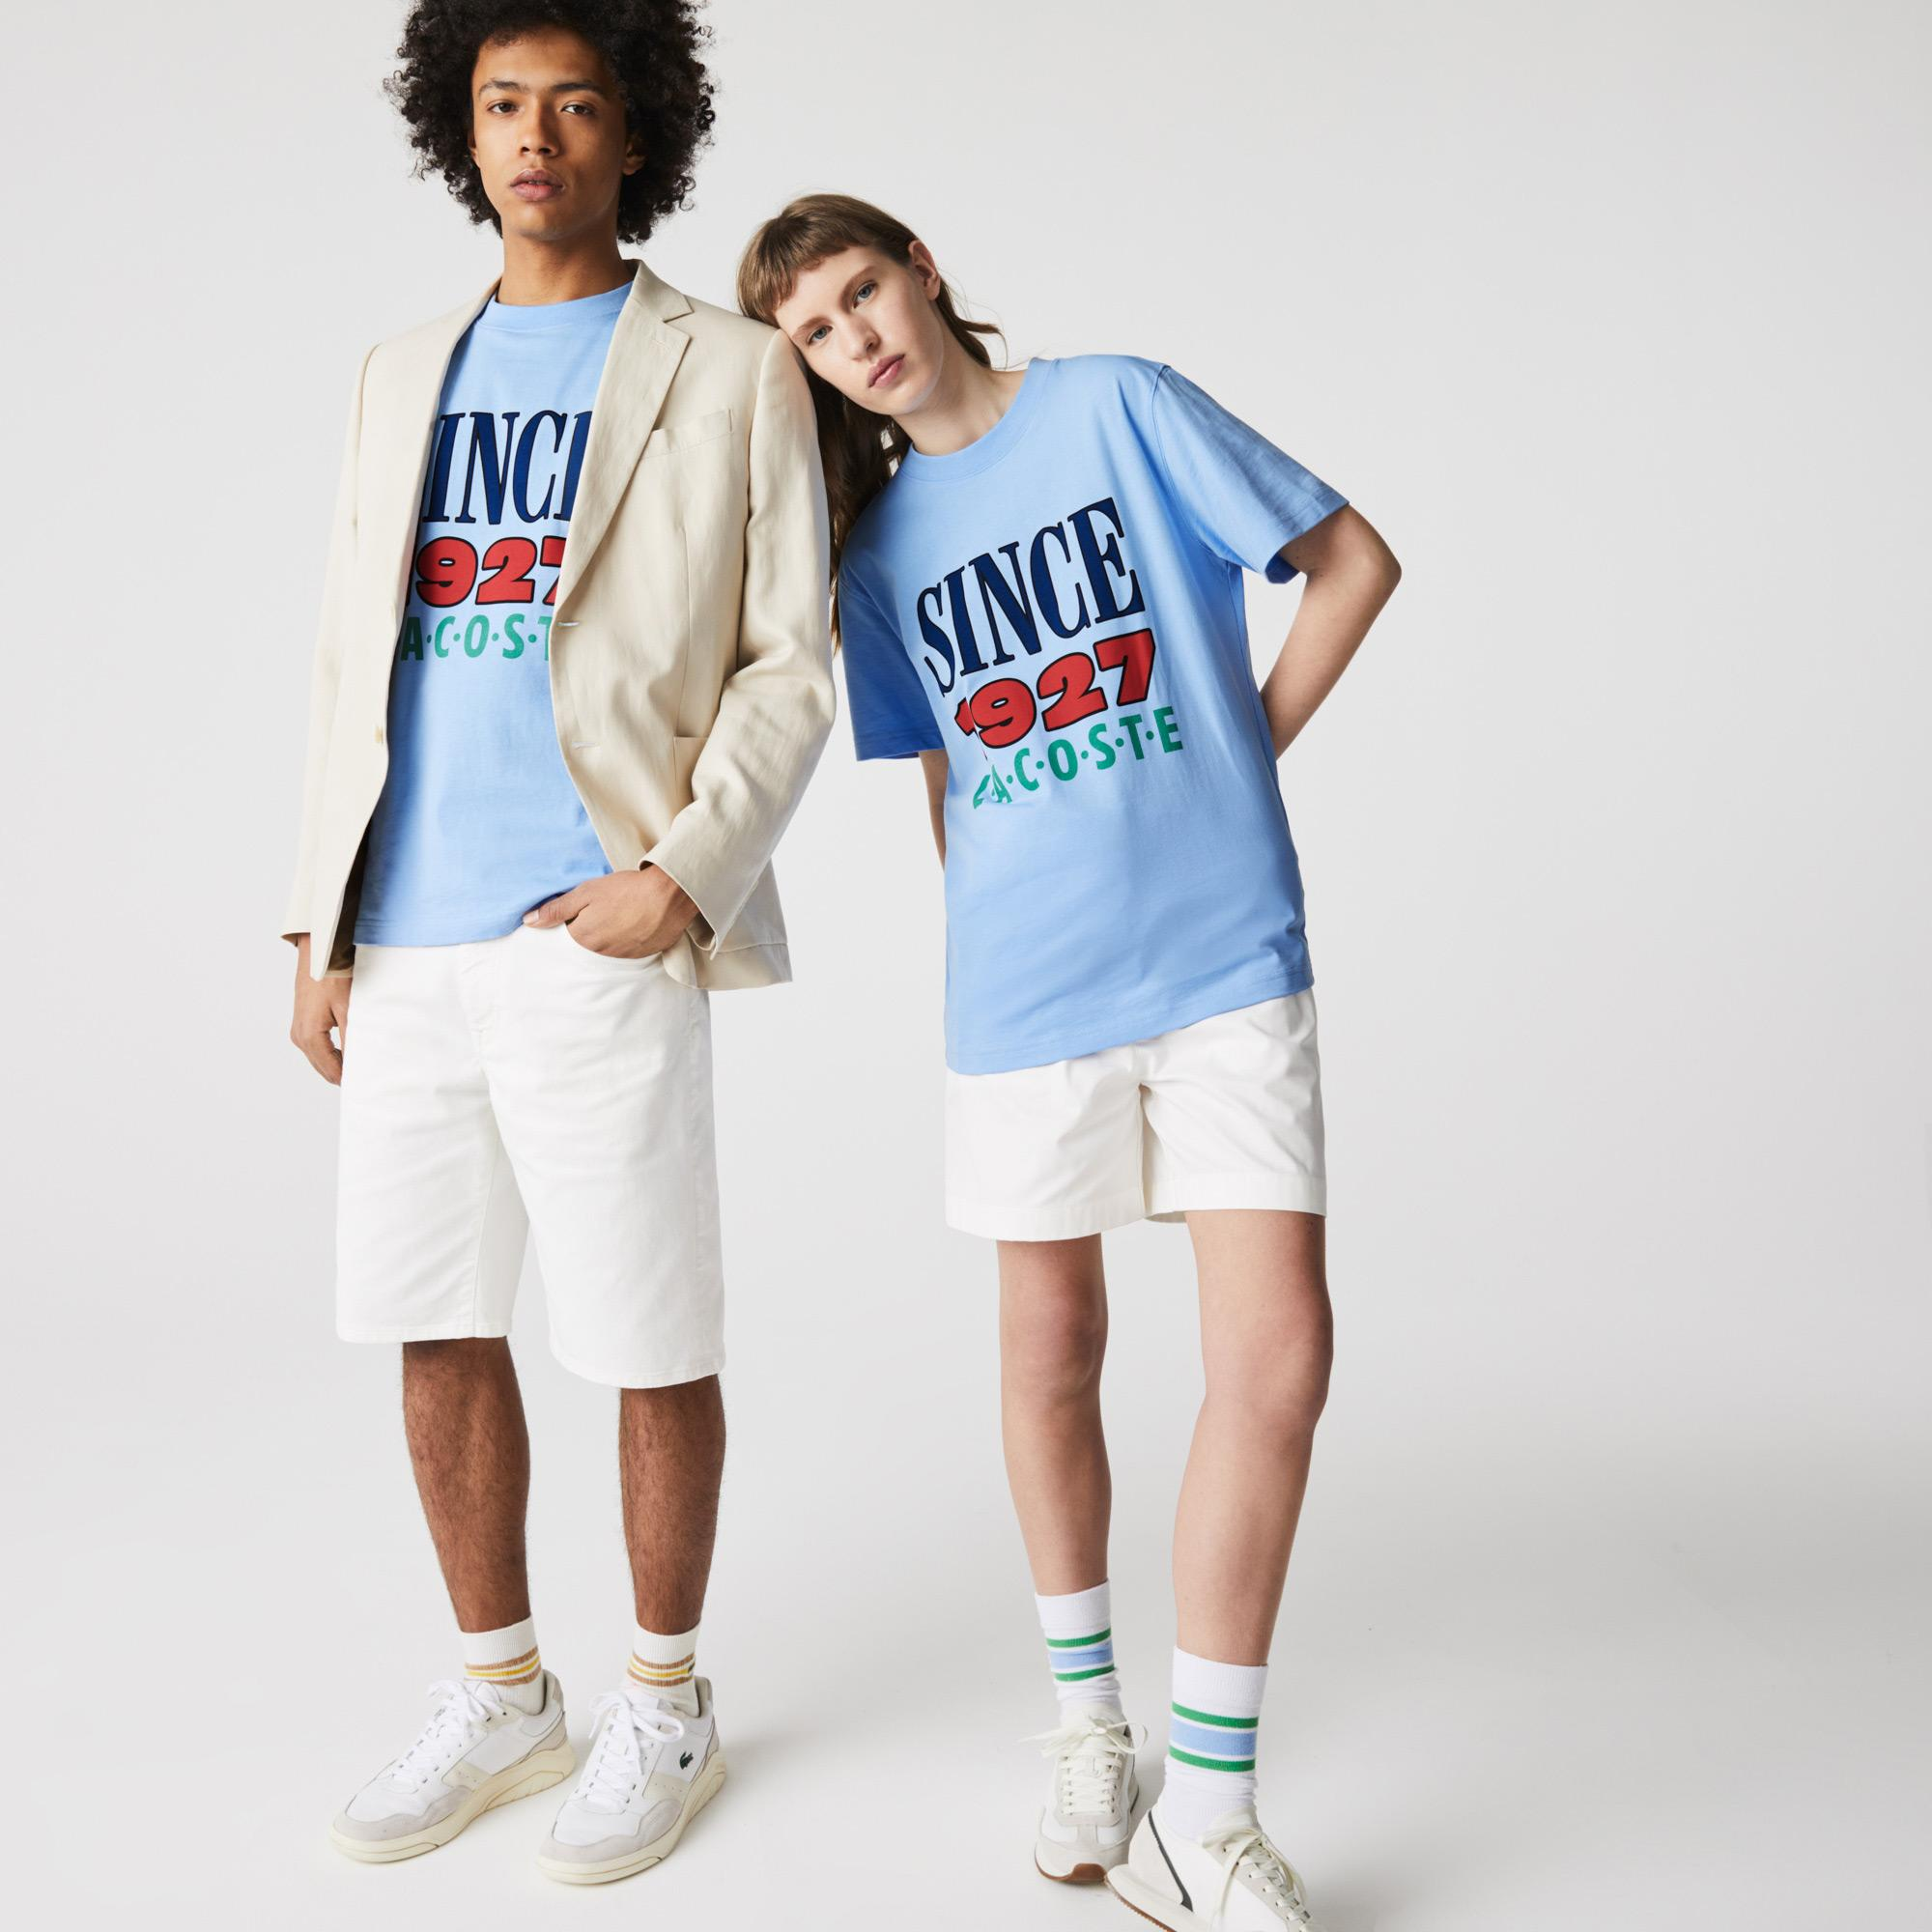 Lacoste L!VE Bawełniany T-shirt unisex z nadrukiem